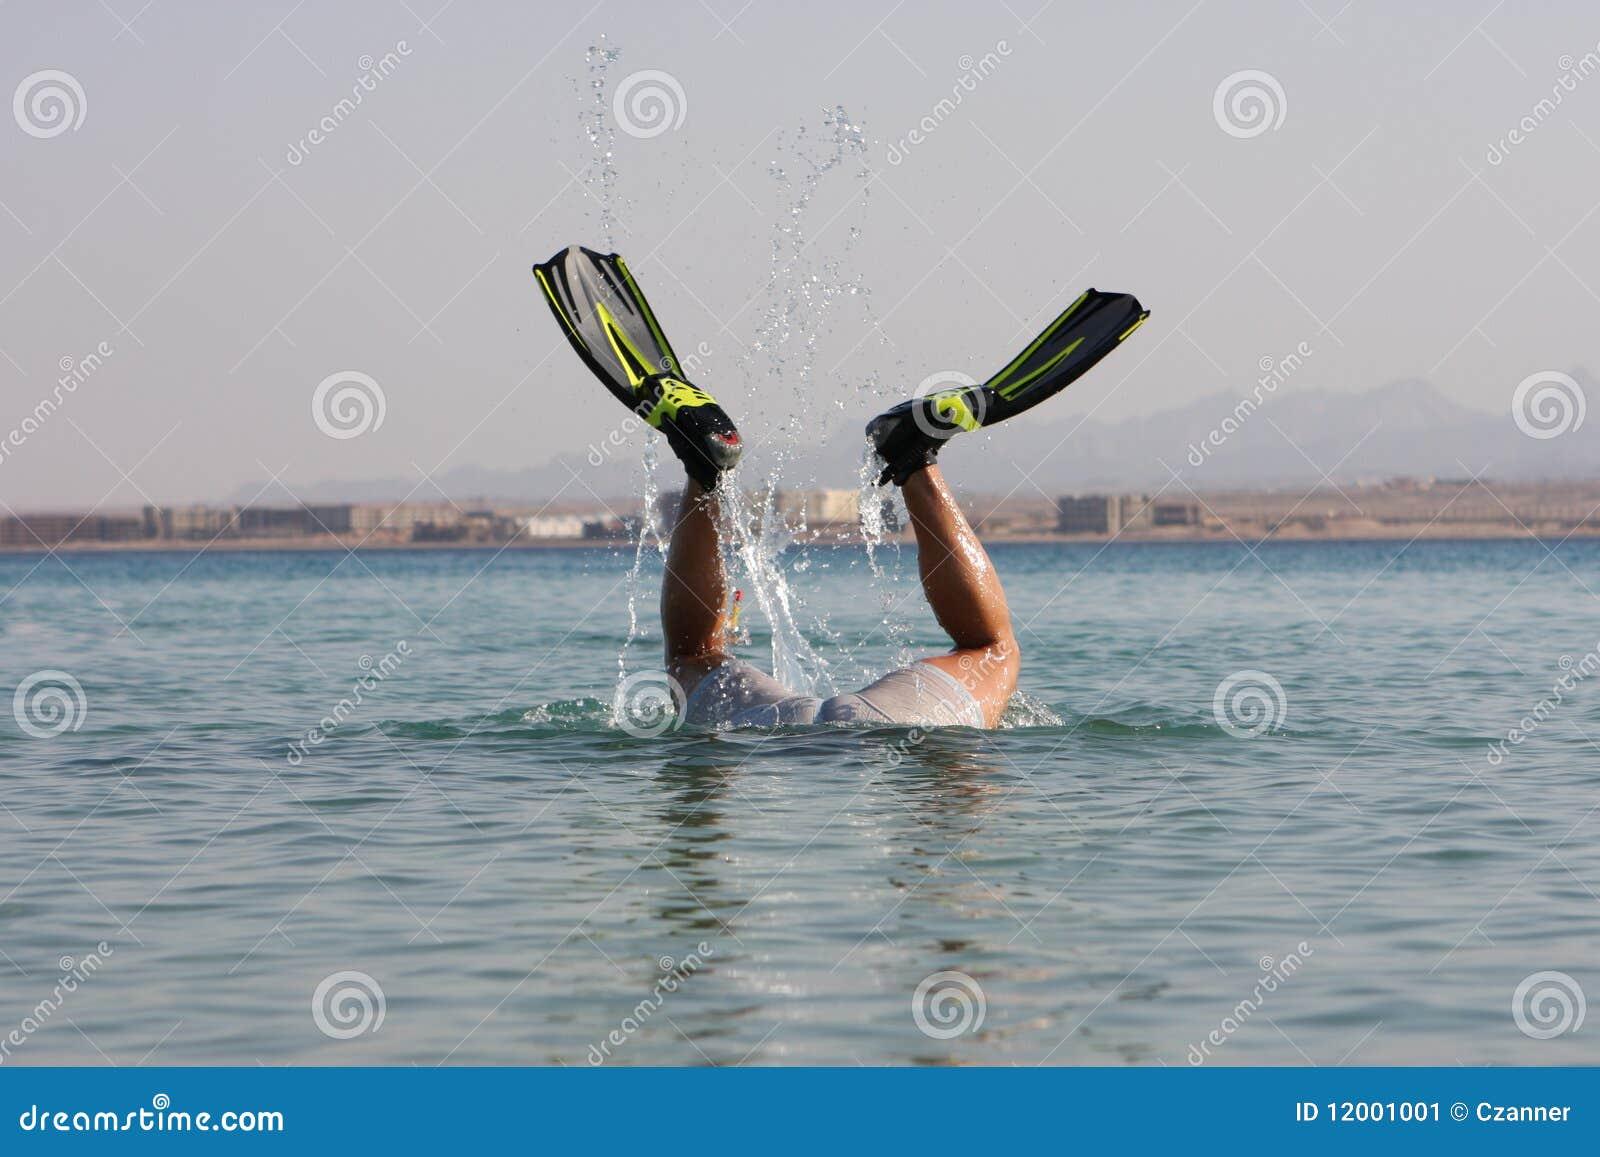 Stock Image Funny Snorkel Man